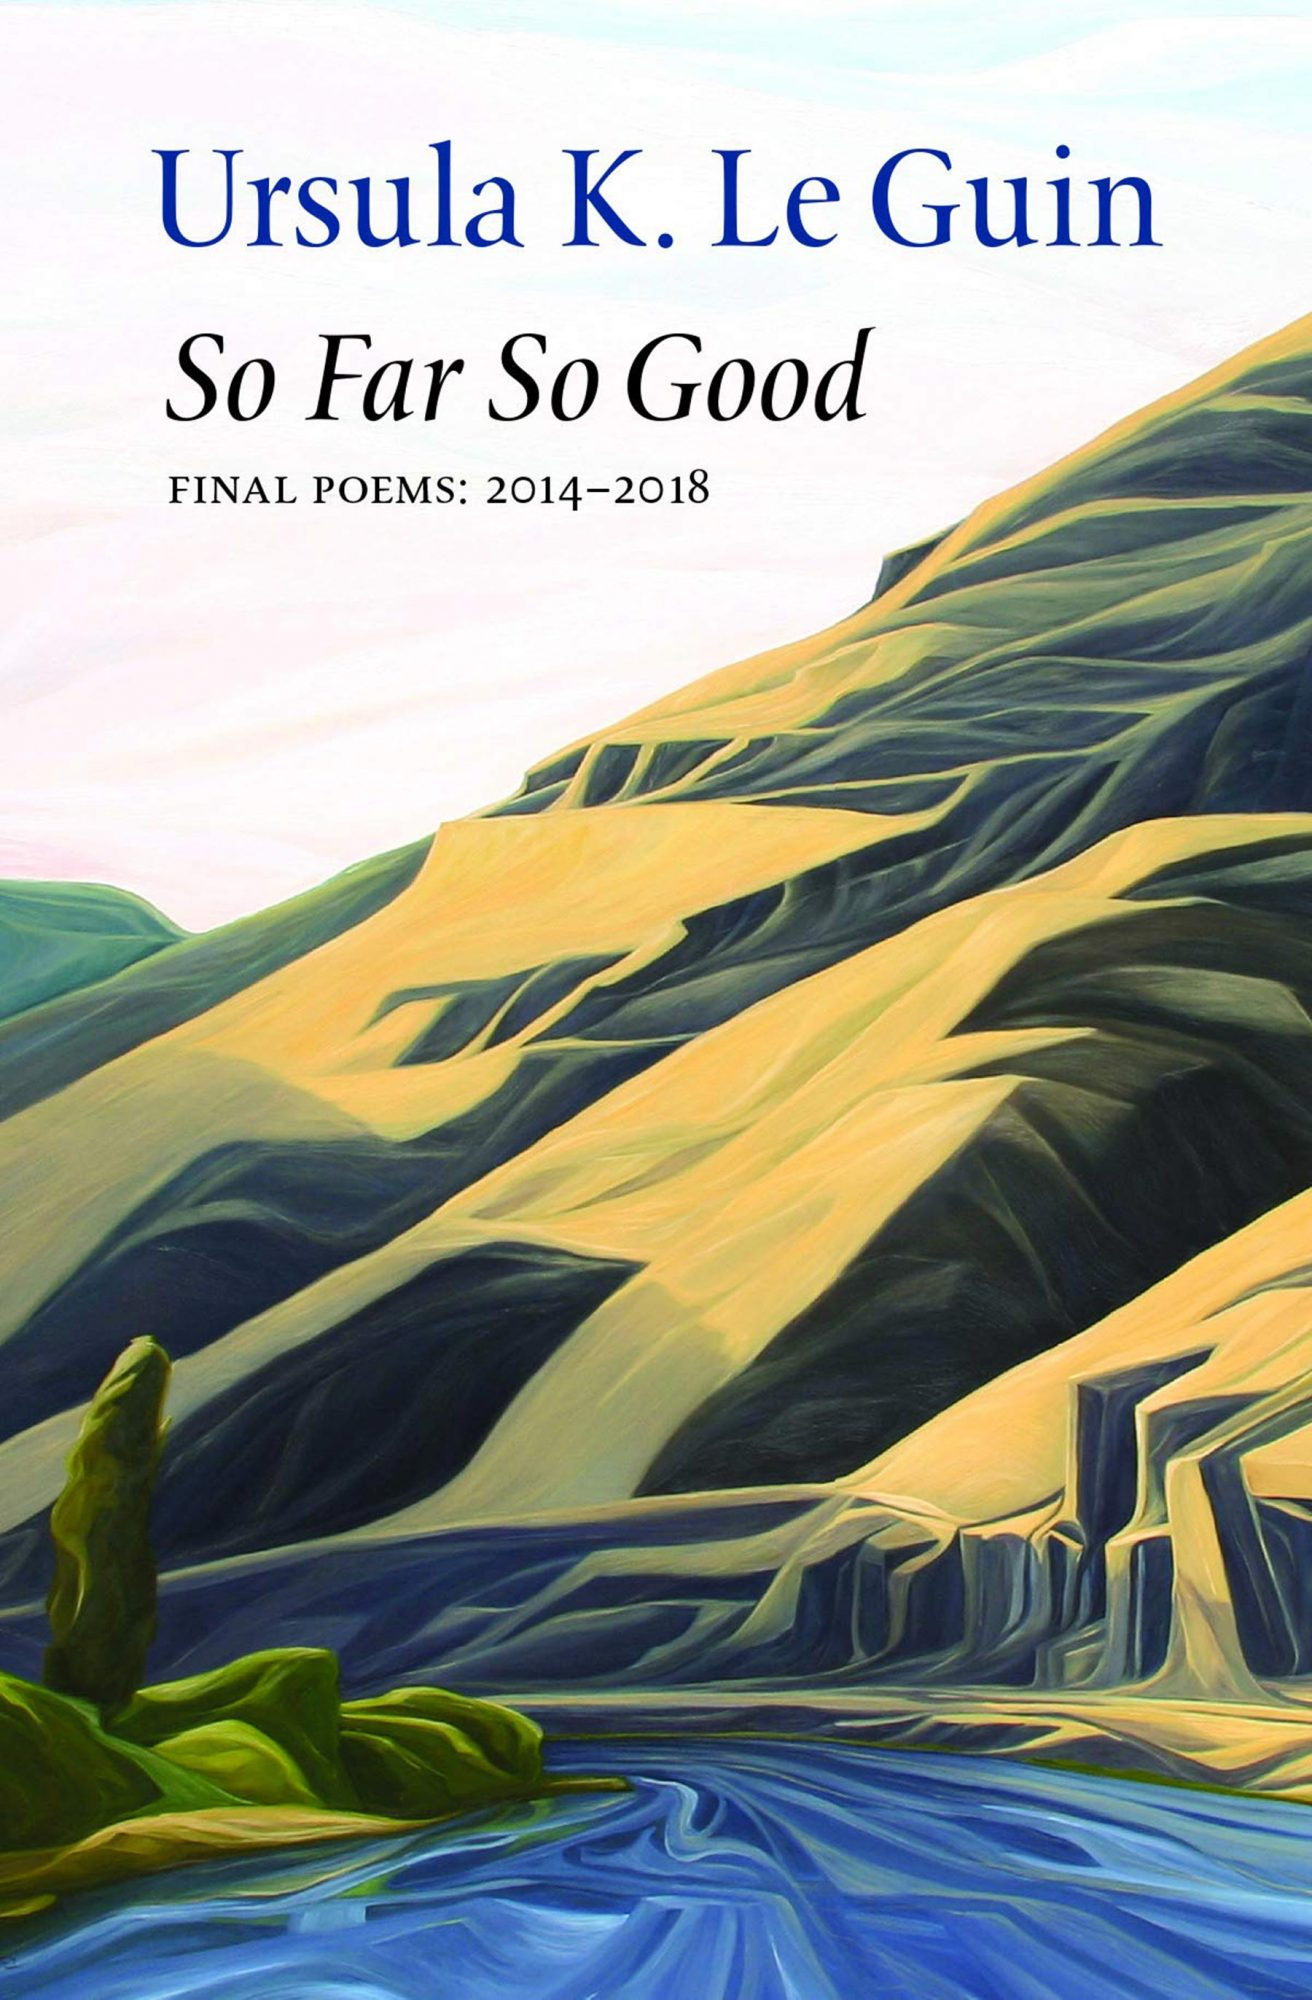 So Far So Good by Ursula K. Le GuinPublisher: Copper Canyon Press